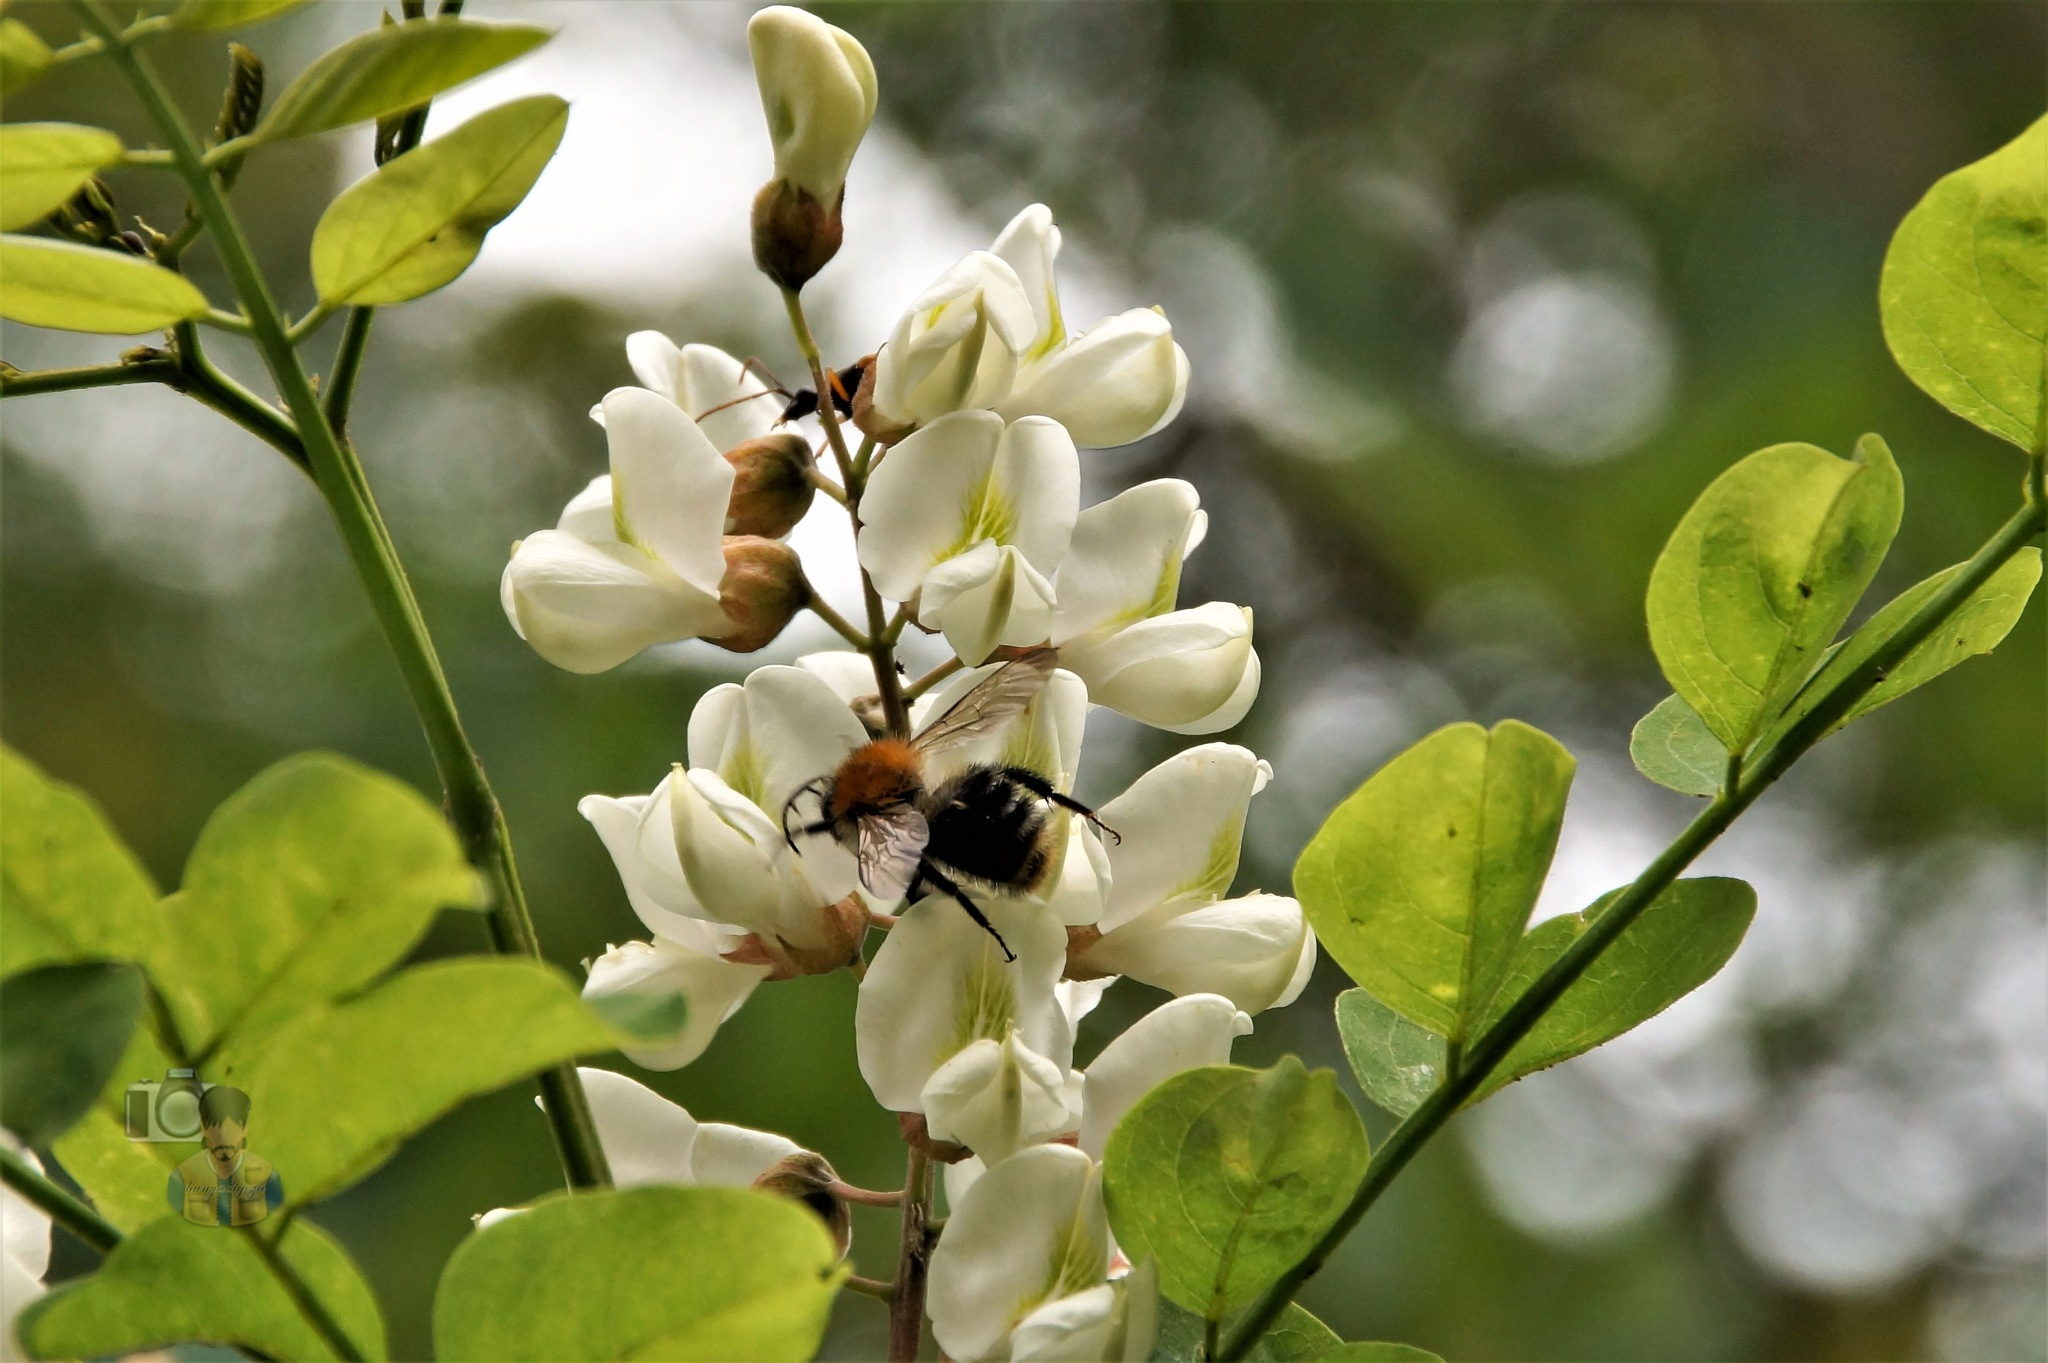 July 16, bumblebee on black locust second blossom by hunyadigeza